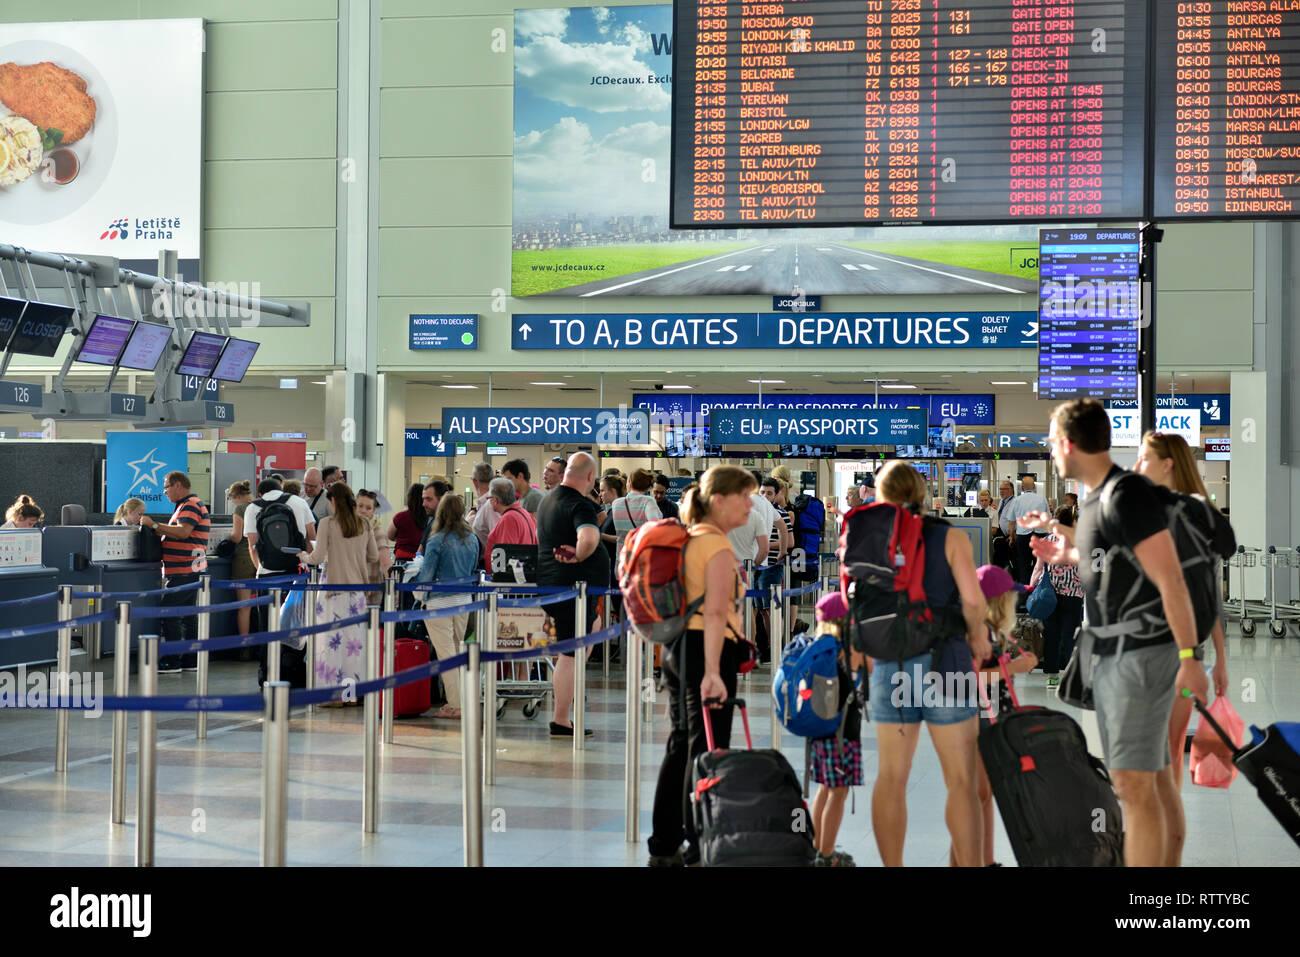 Passengers departures, looking at schedule boards in Vaclav Havel Airport terminal 1,  Prague, Czech Republic - Stock Image